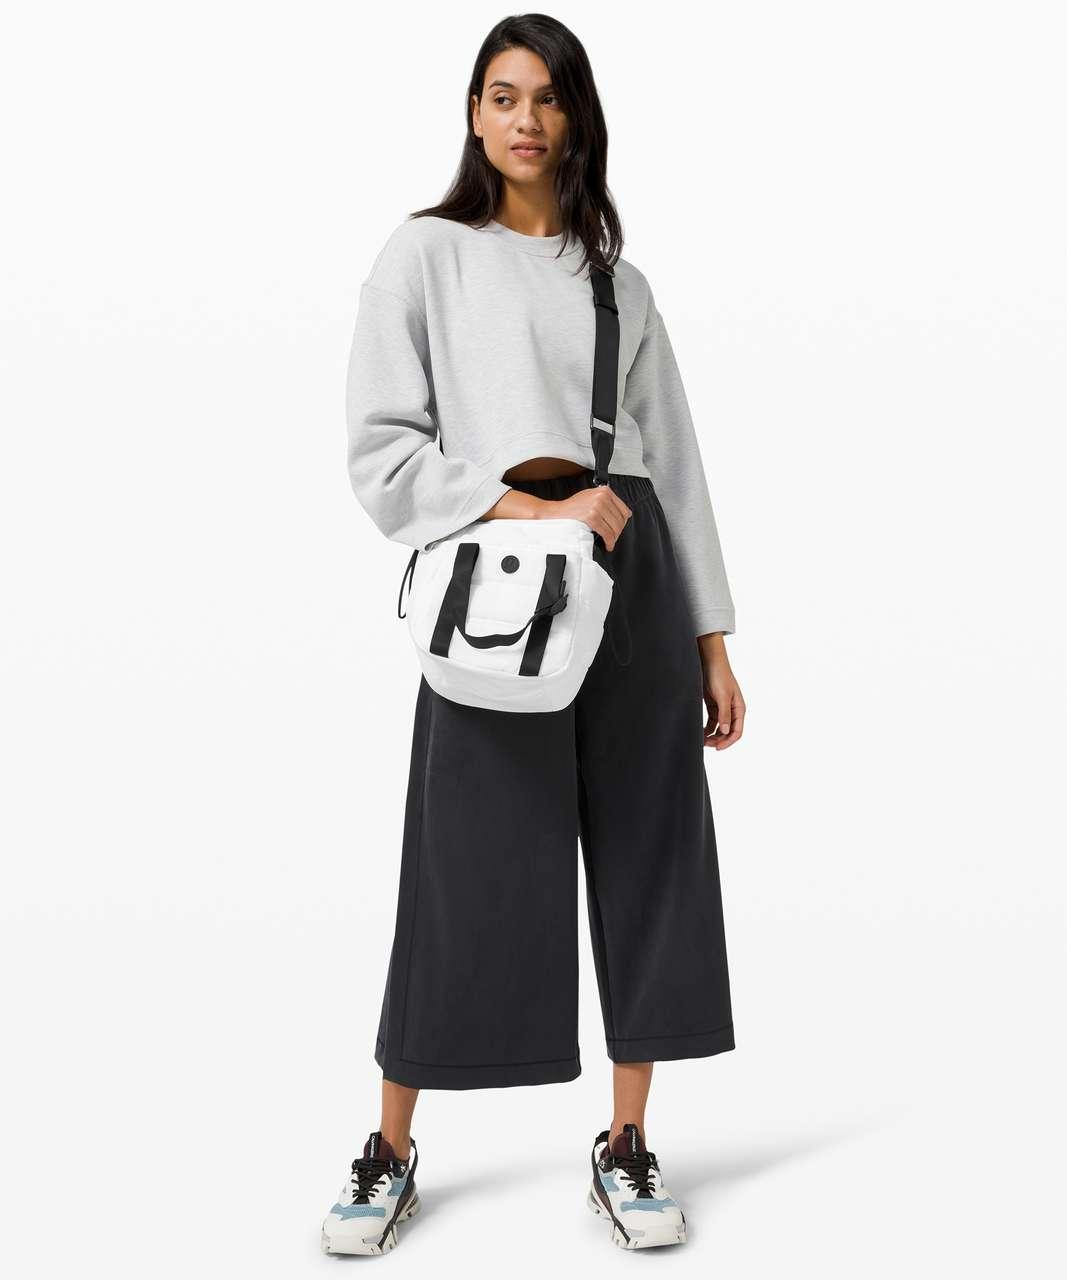 Lululemon Dash All Day Bucket Bag *6.5L - White